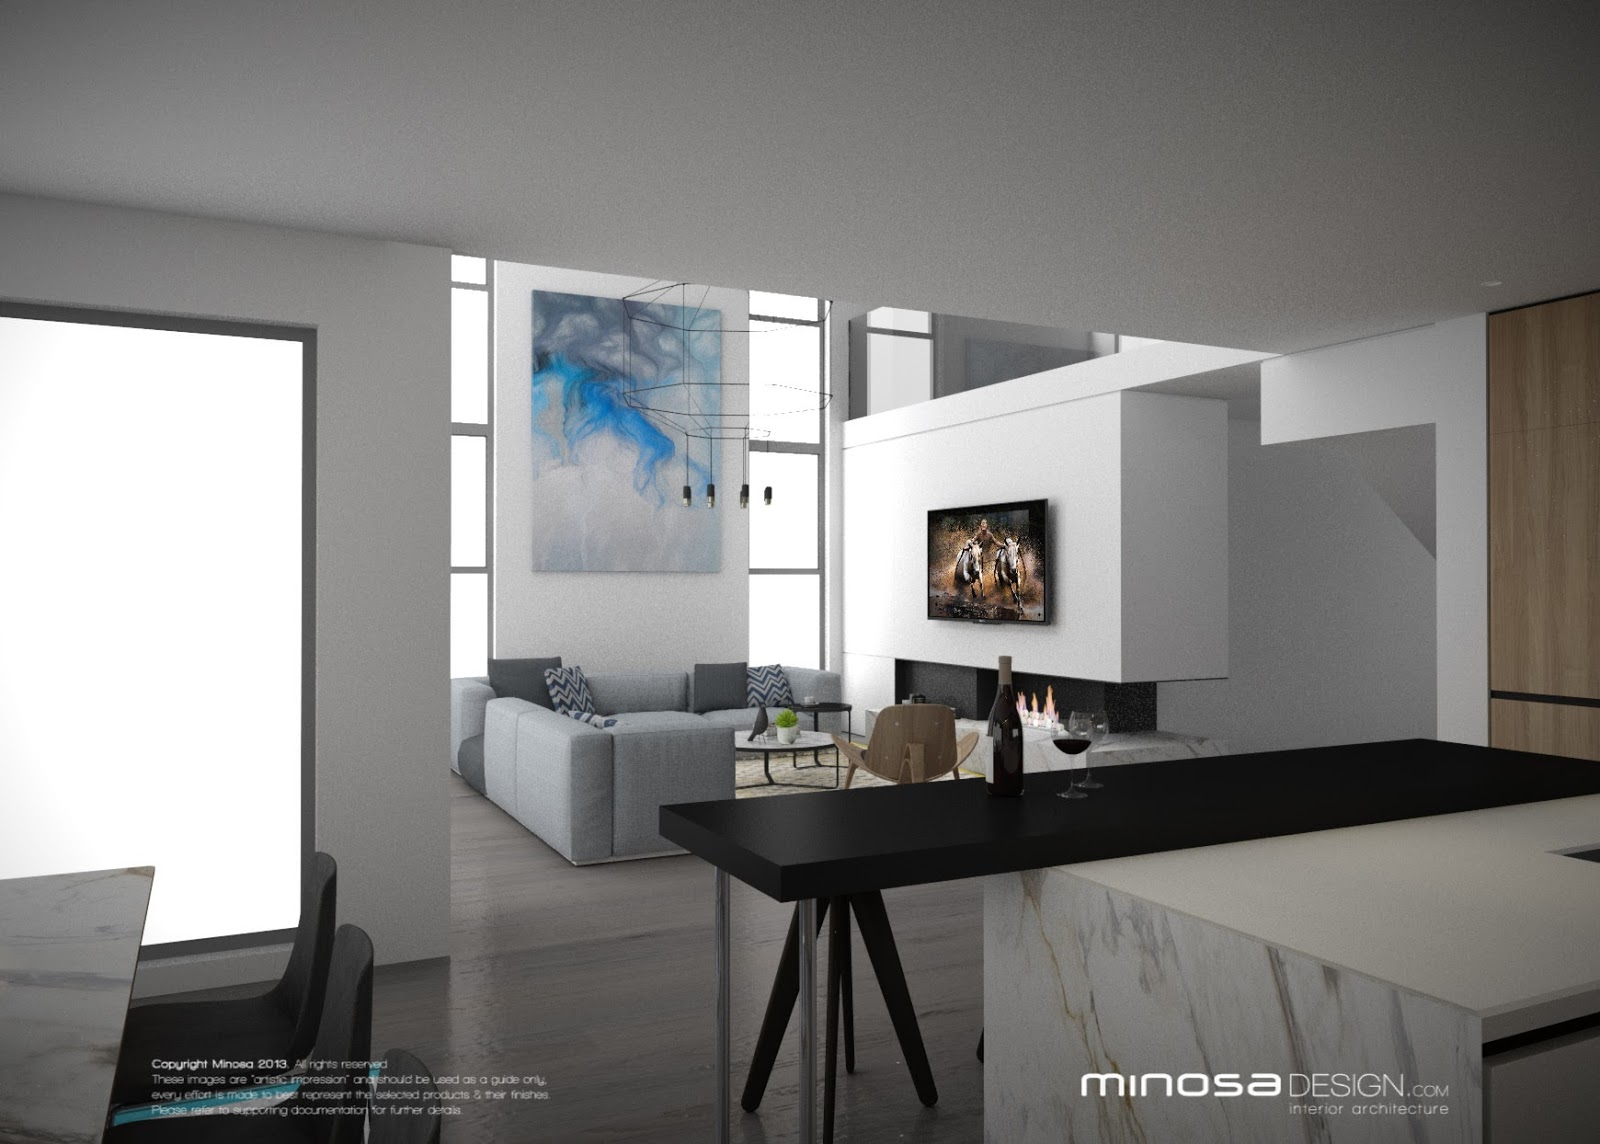 Living Room And Kitchen Design Minosa Design The Modern Living Room Kitchen Lounge Dine